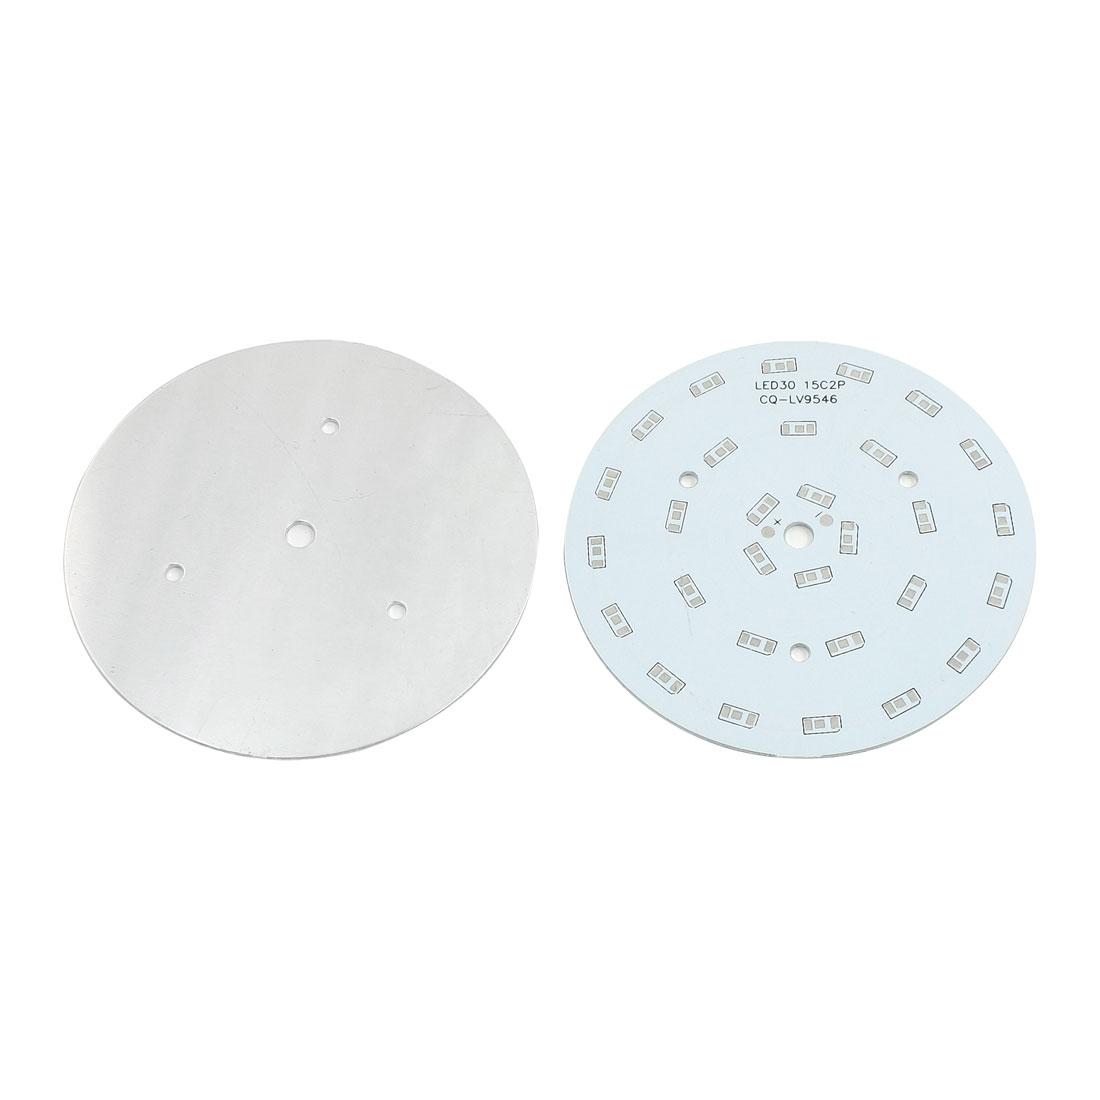 2Pcs 30 x 1/2W 5730 SMD LED High Power DIY Circle Aluminum PCB Circuit Board 100mm Diameter